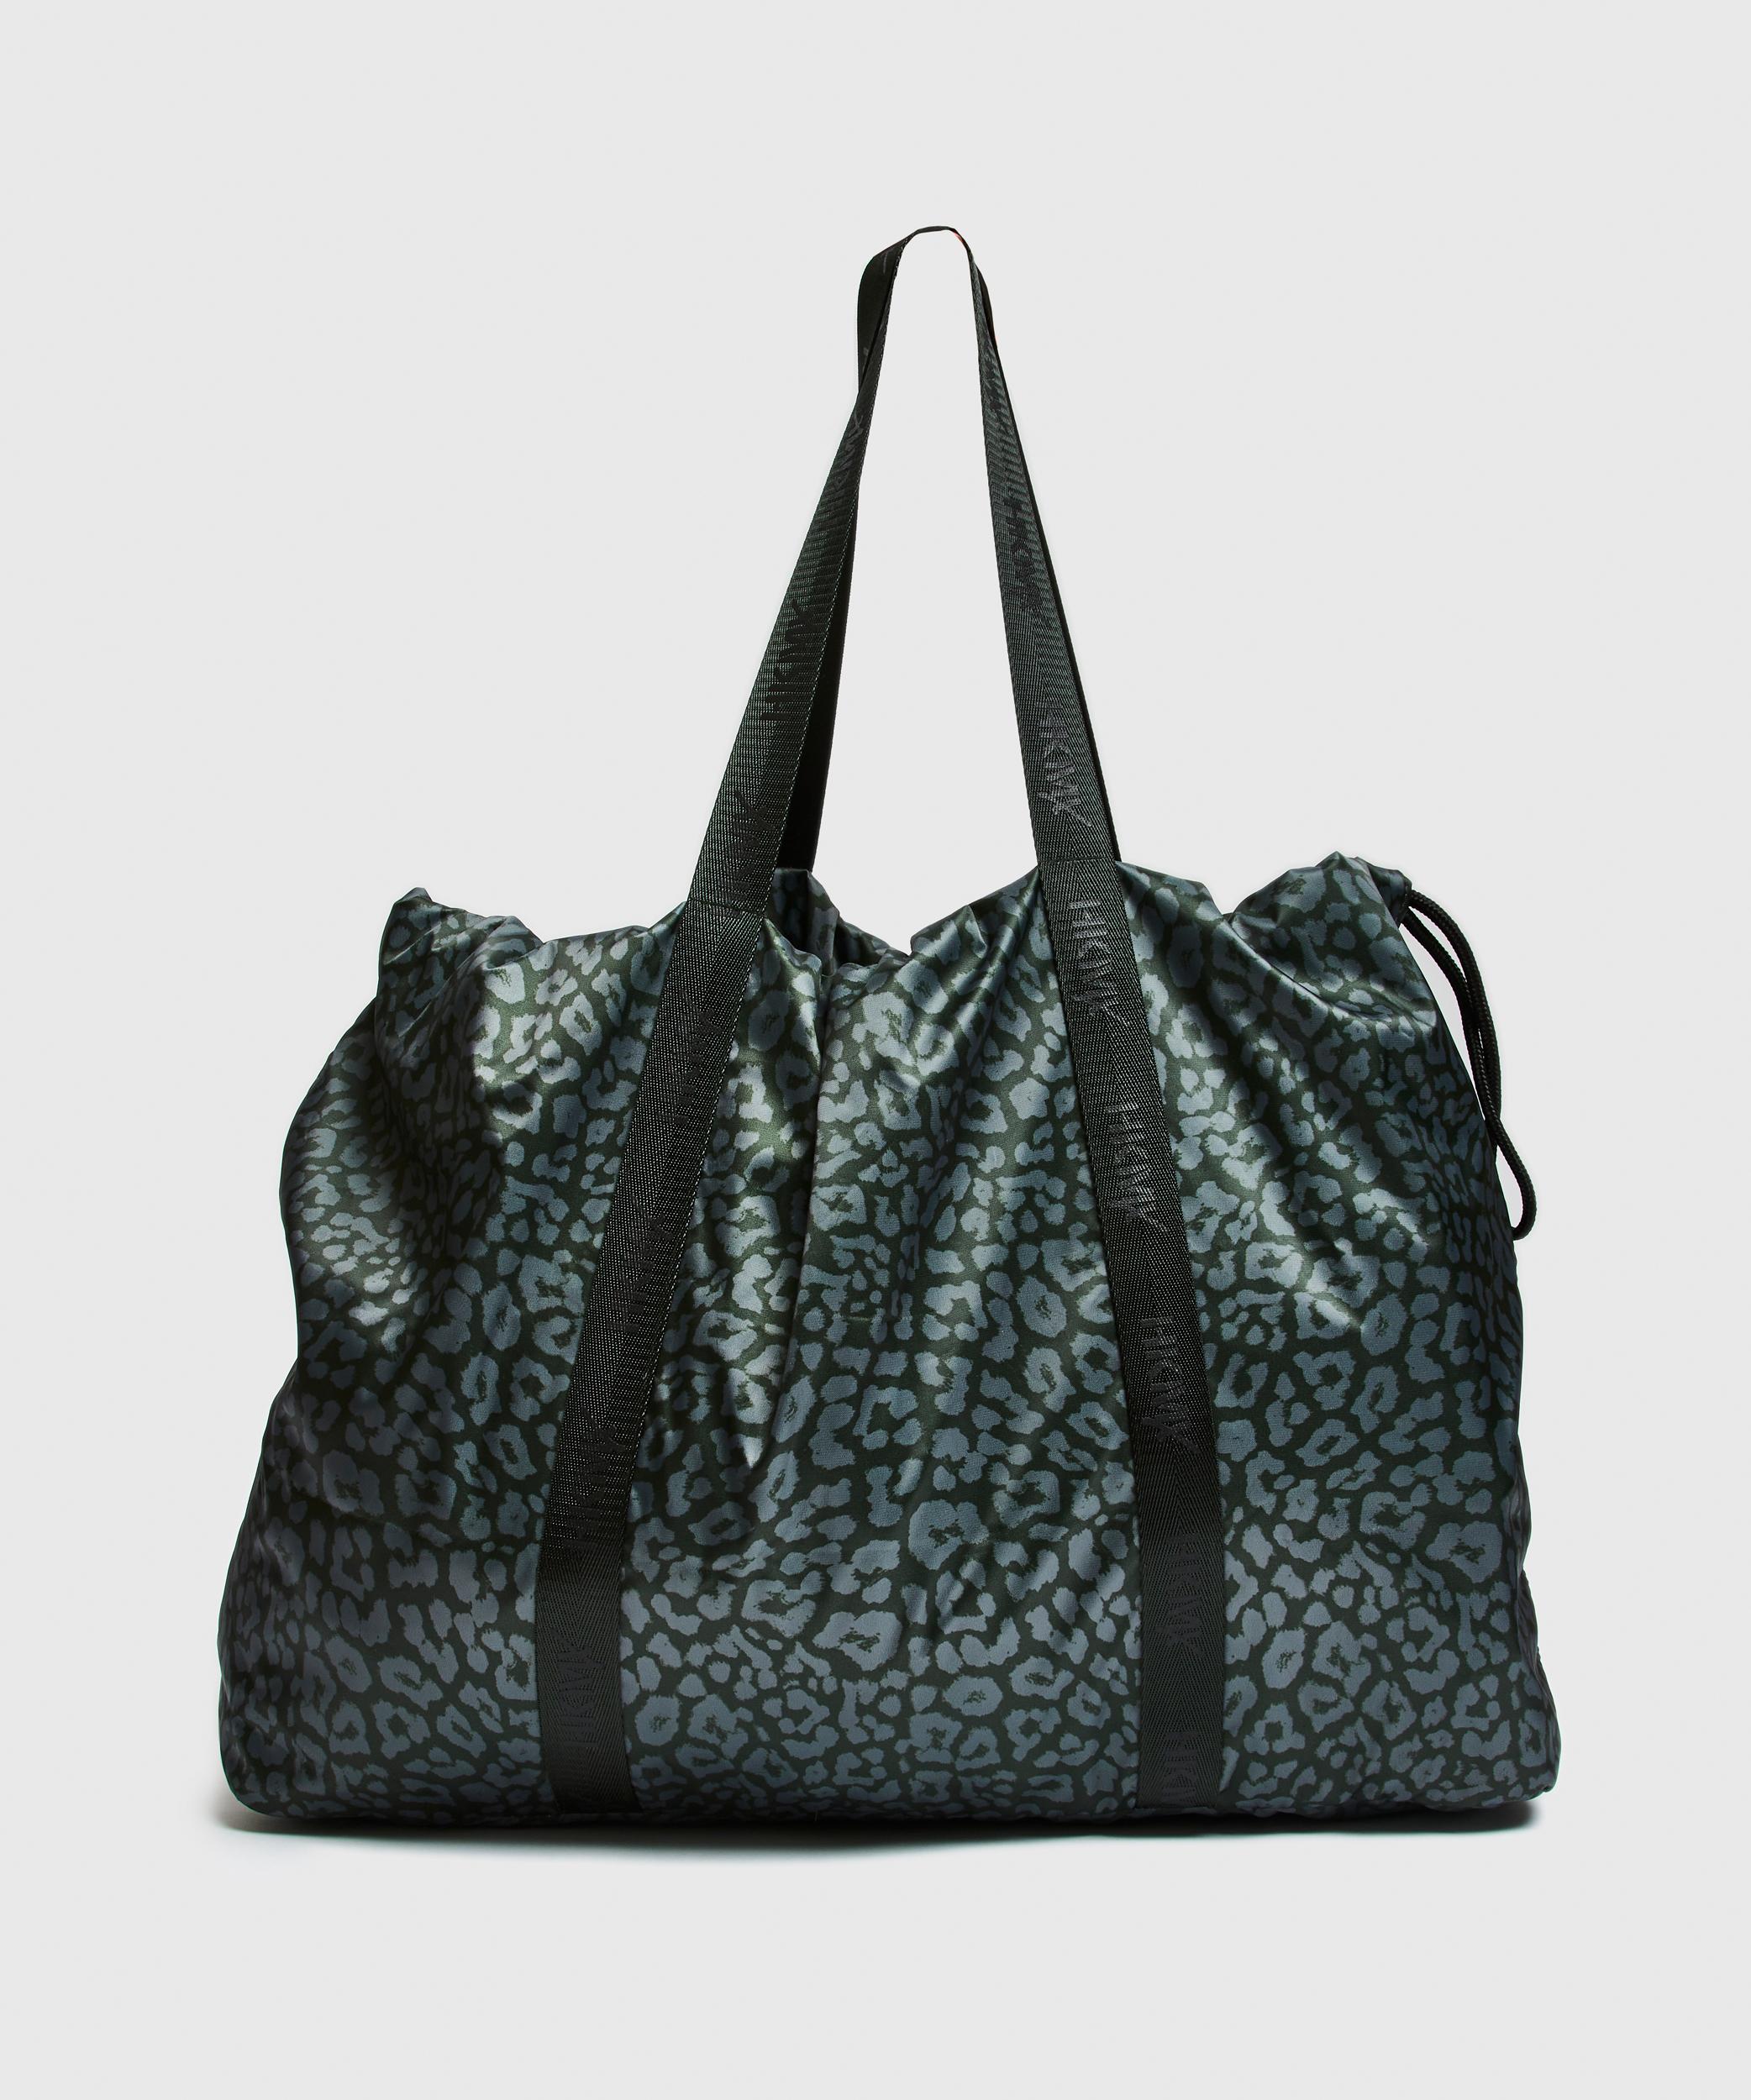 HKMX Stor väska, grön, main